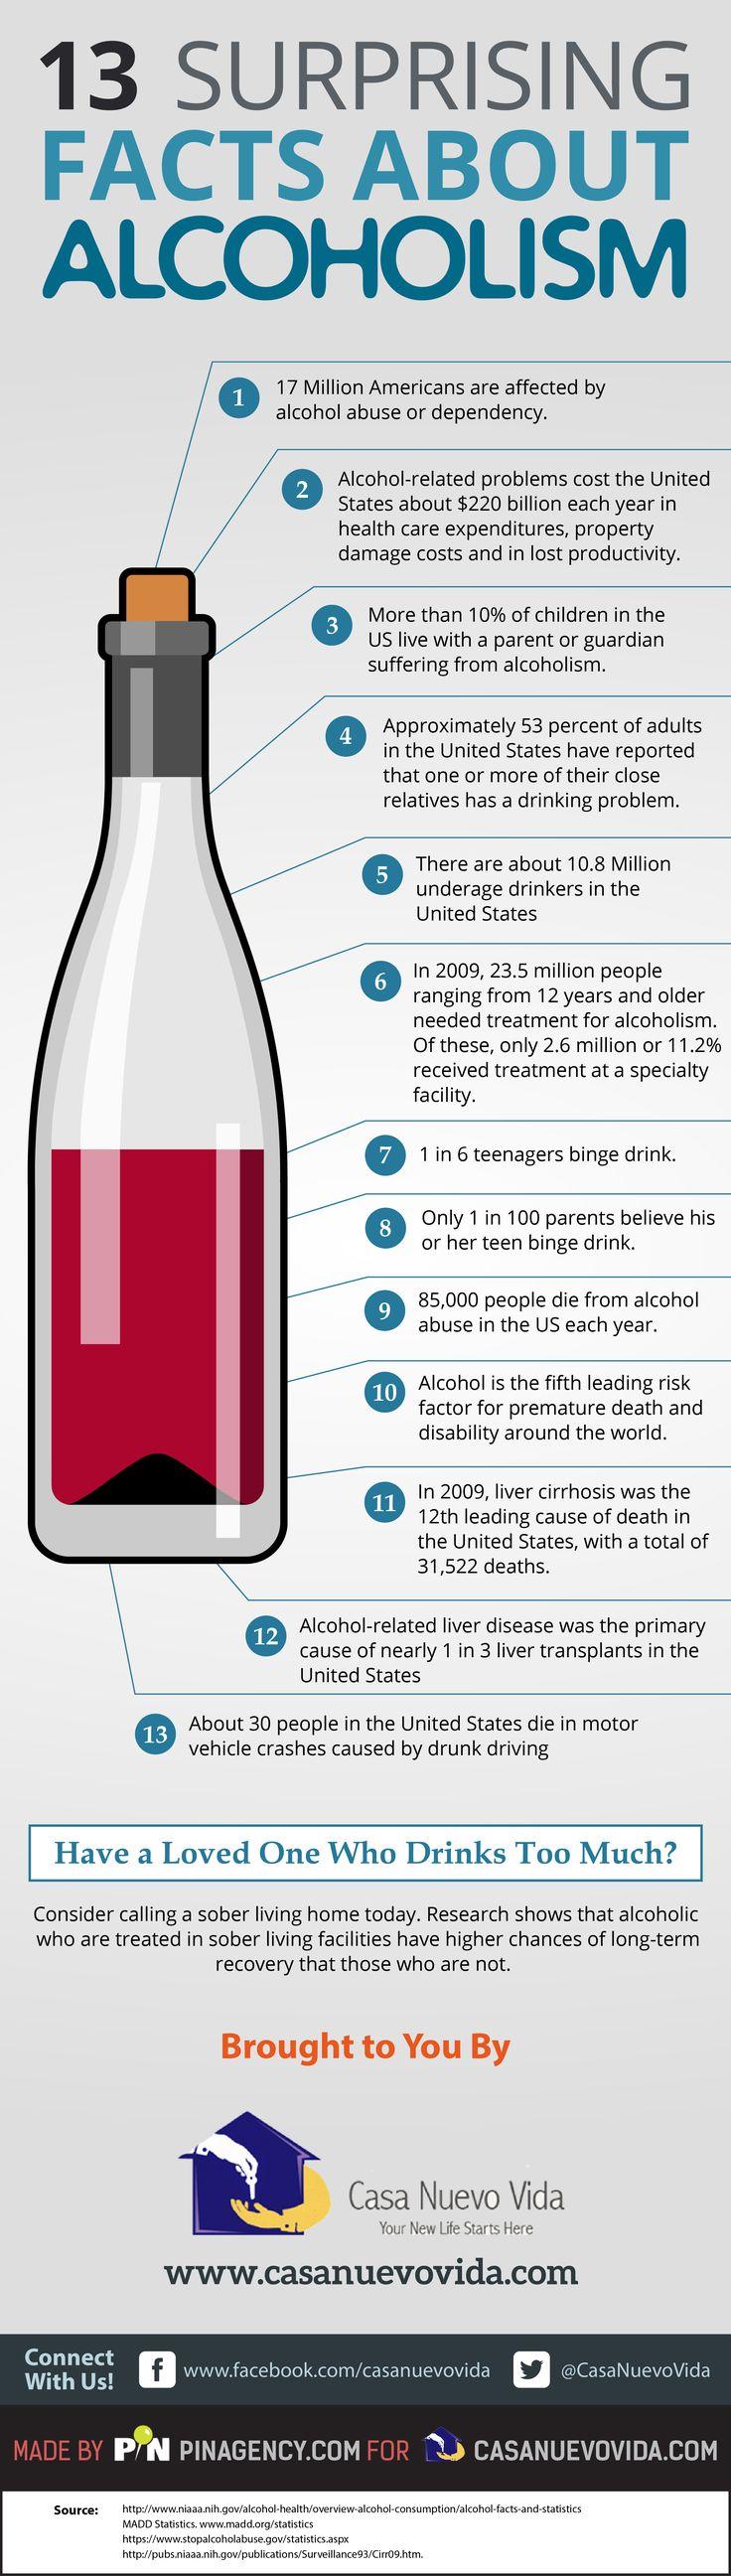 13 Surprising Facts About Alcoholism